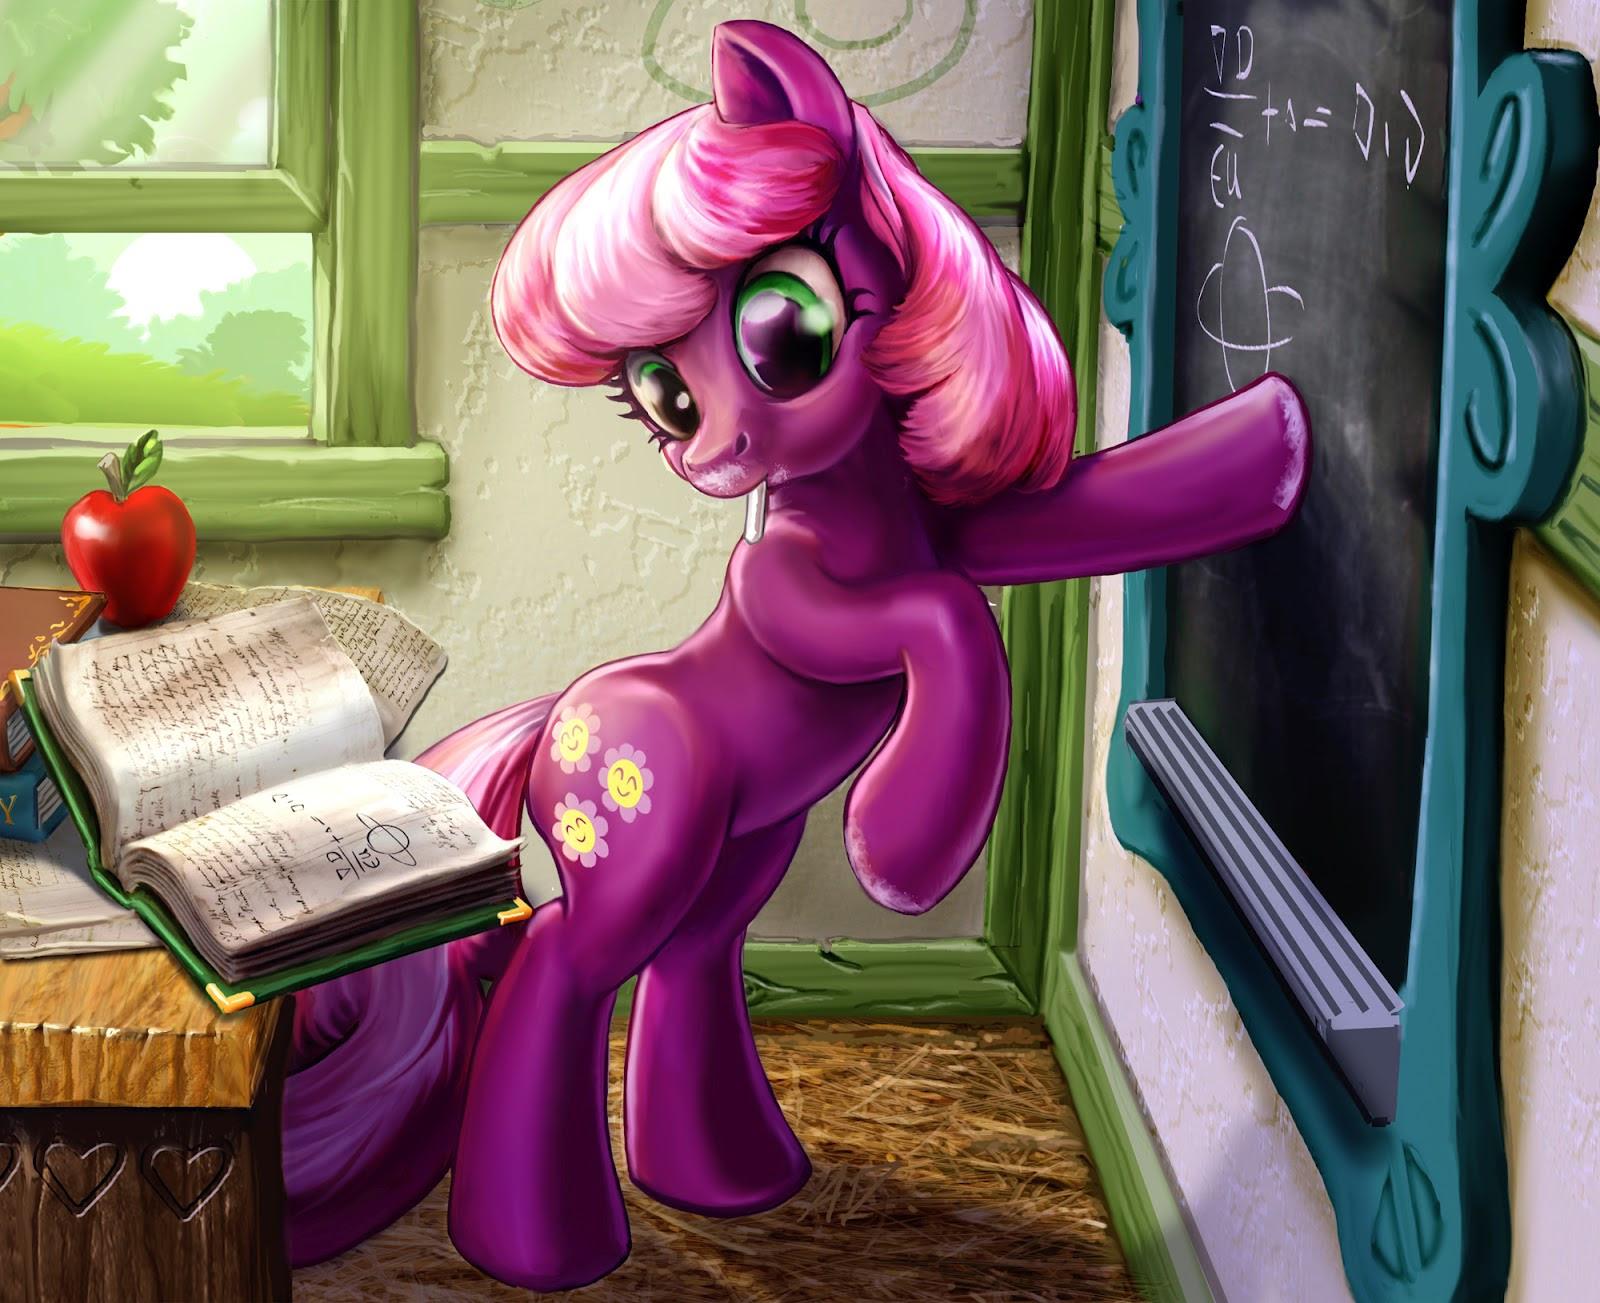 Awesome Pony Pics My Little Pony Friendship Is Magic Fan Art